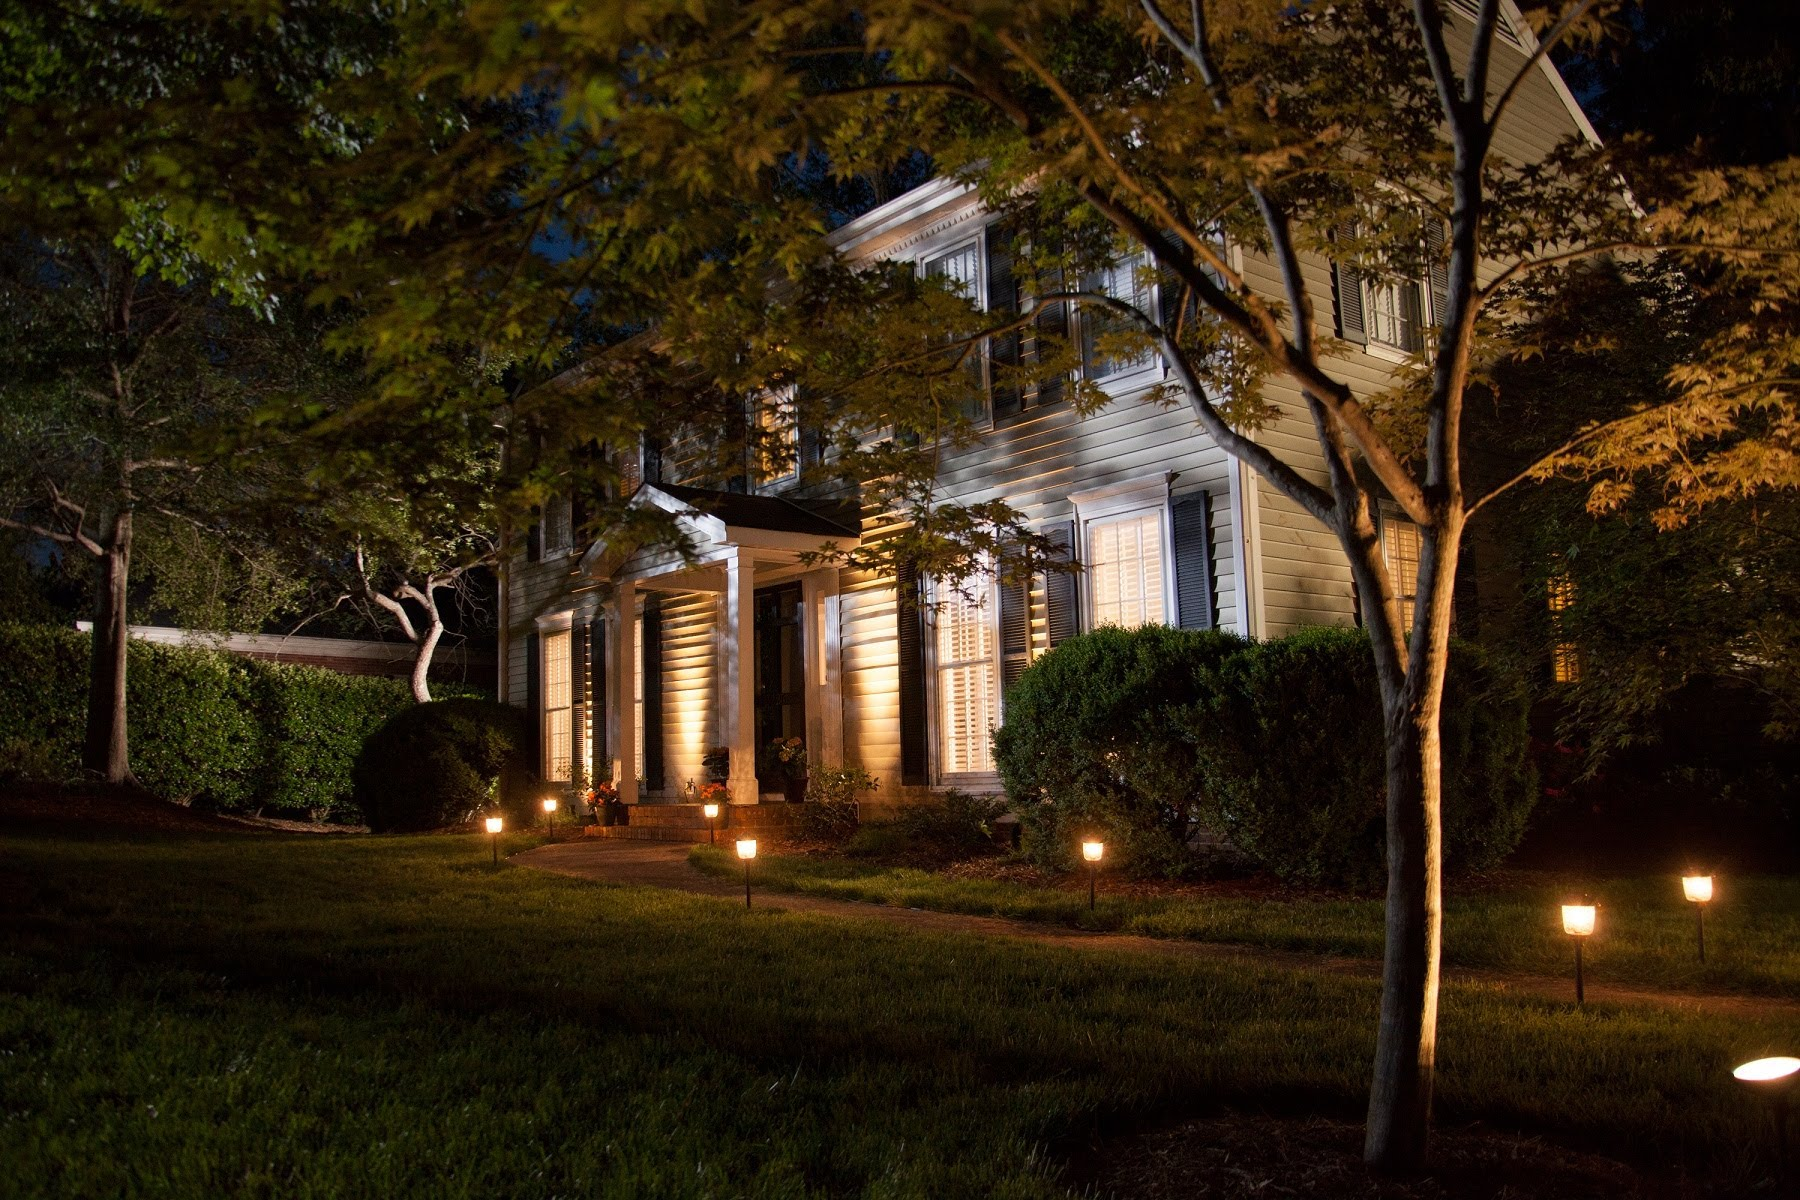 landscape lighting how to install landscaping lighting BKTGNPM